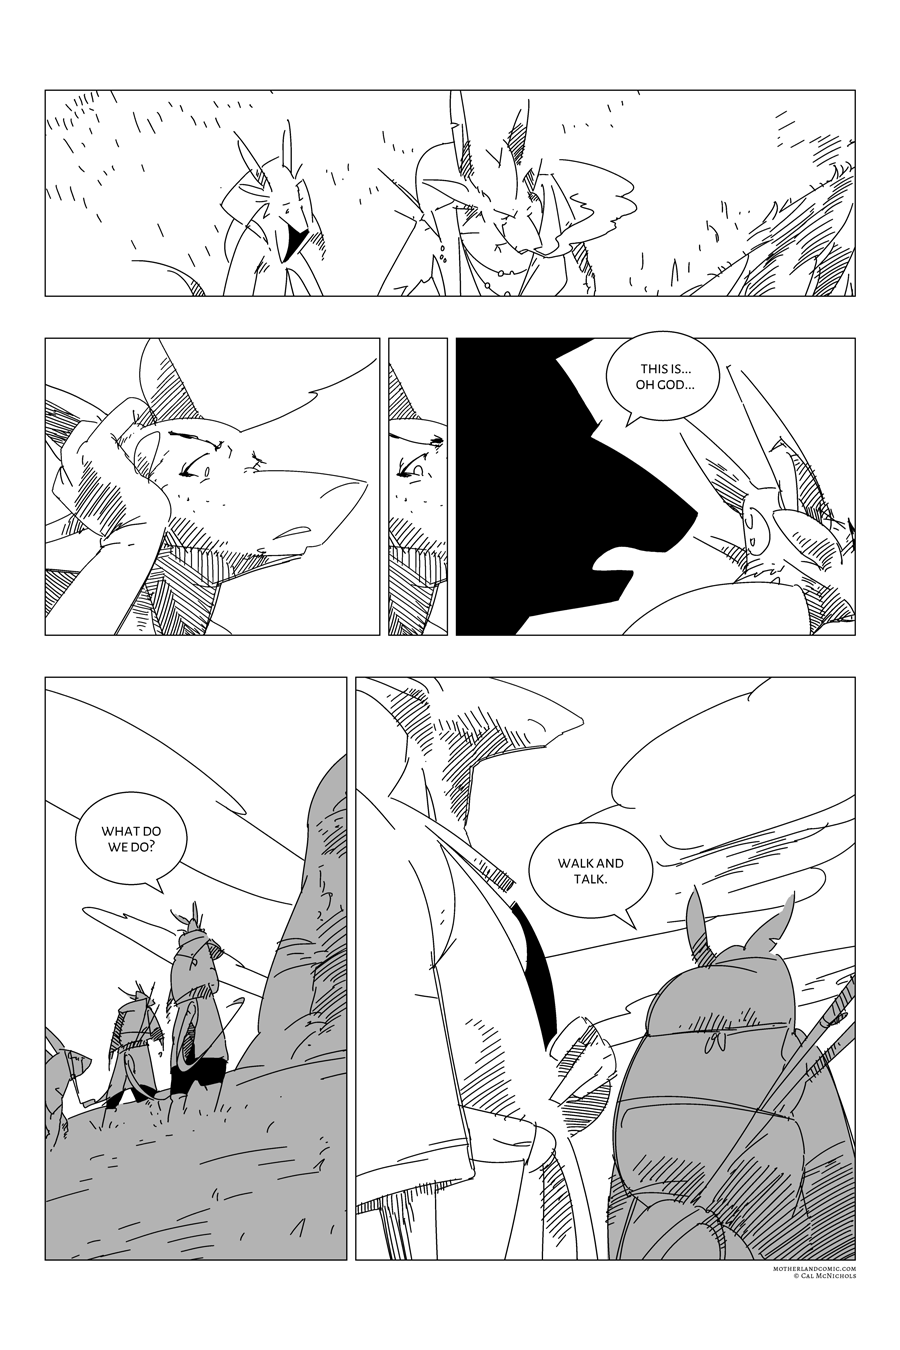 pg 84